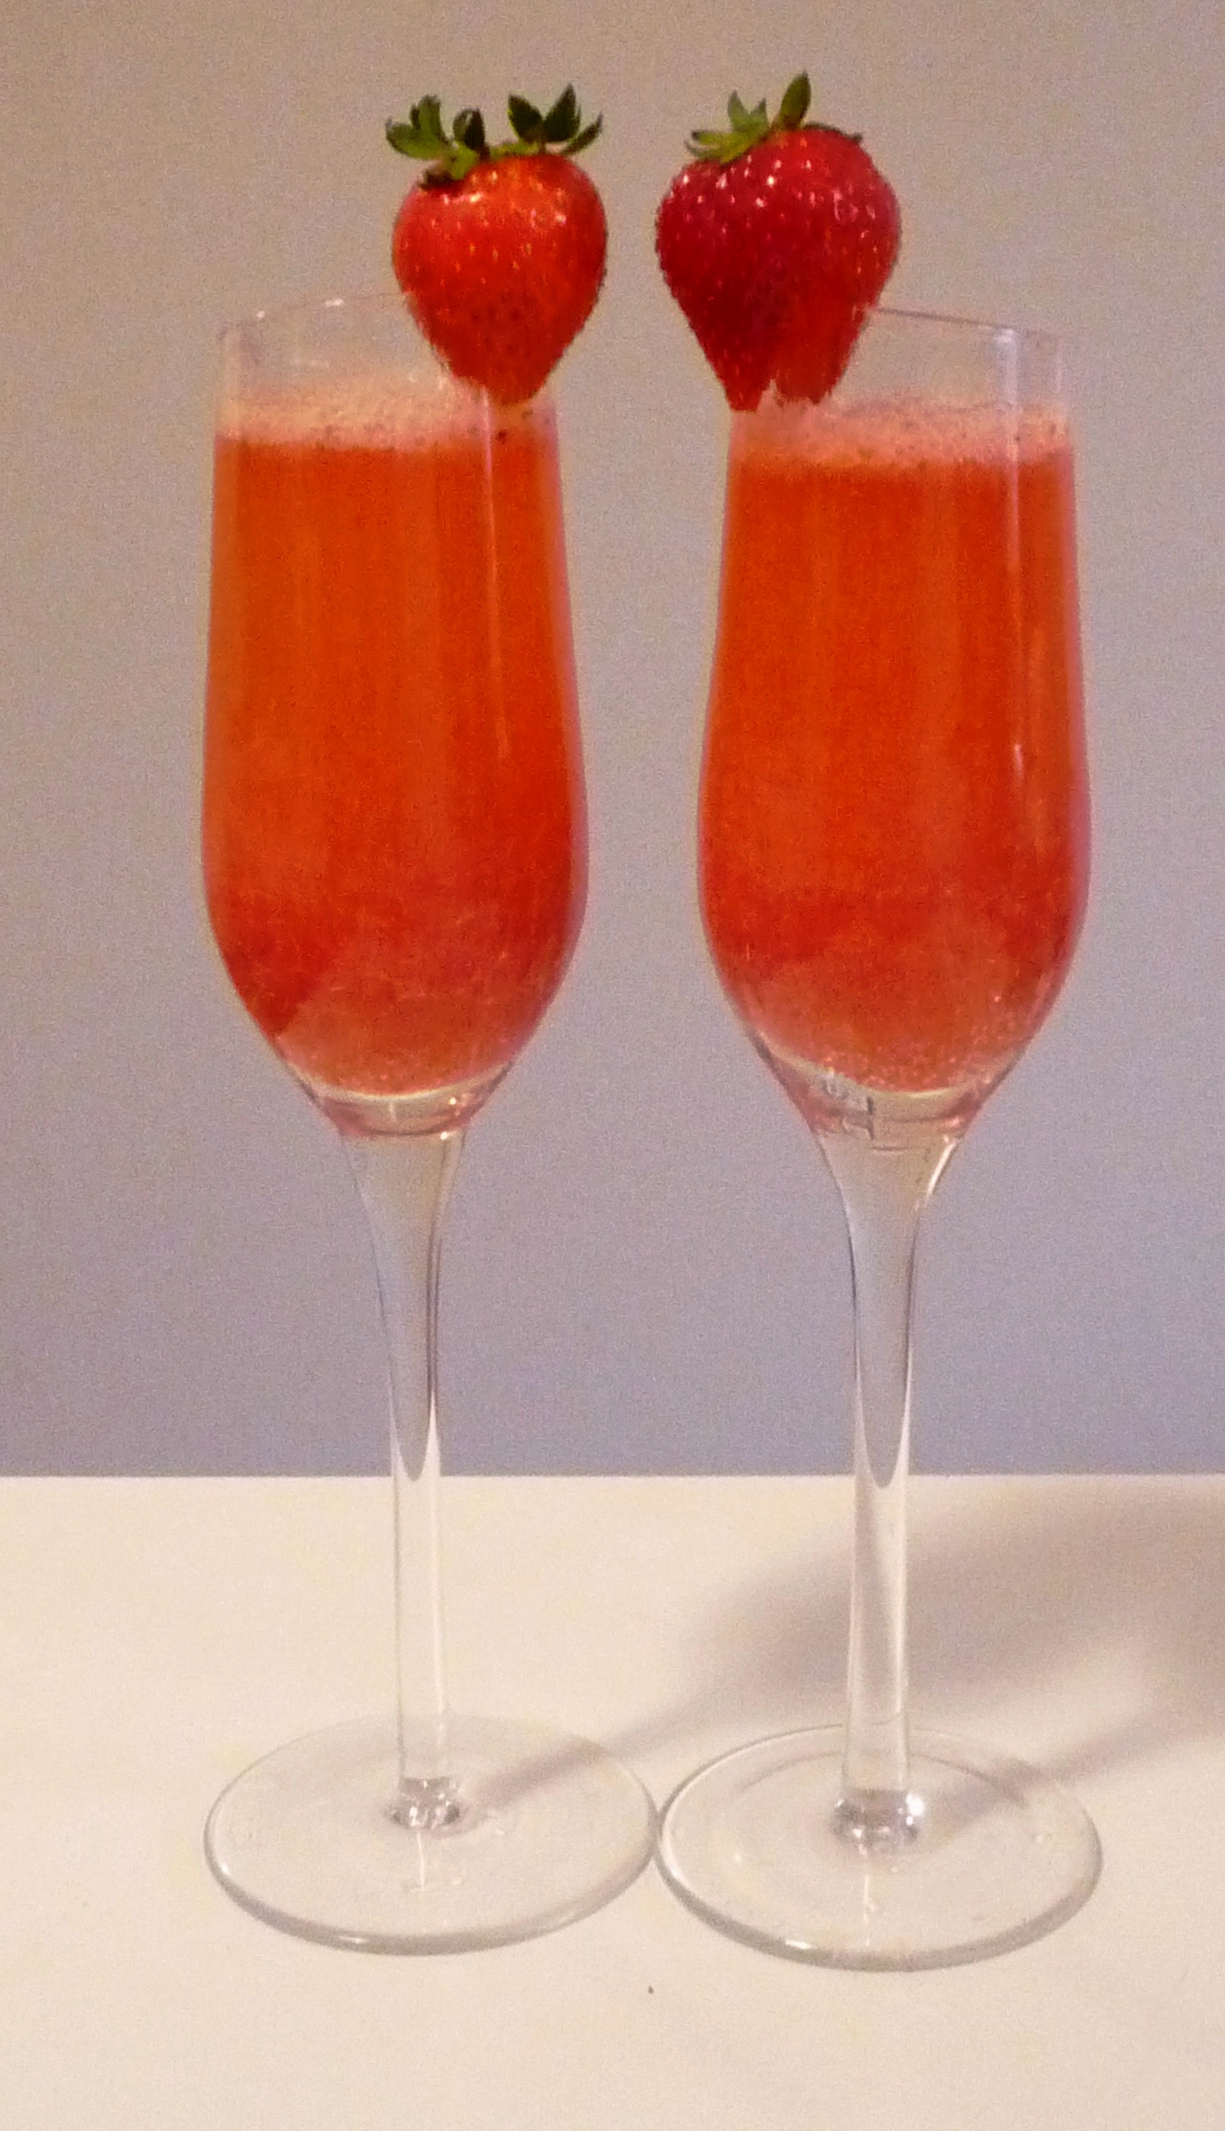 Strawberry Bellini, strawberry and champagne